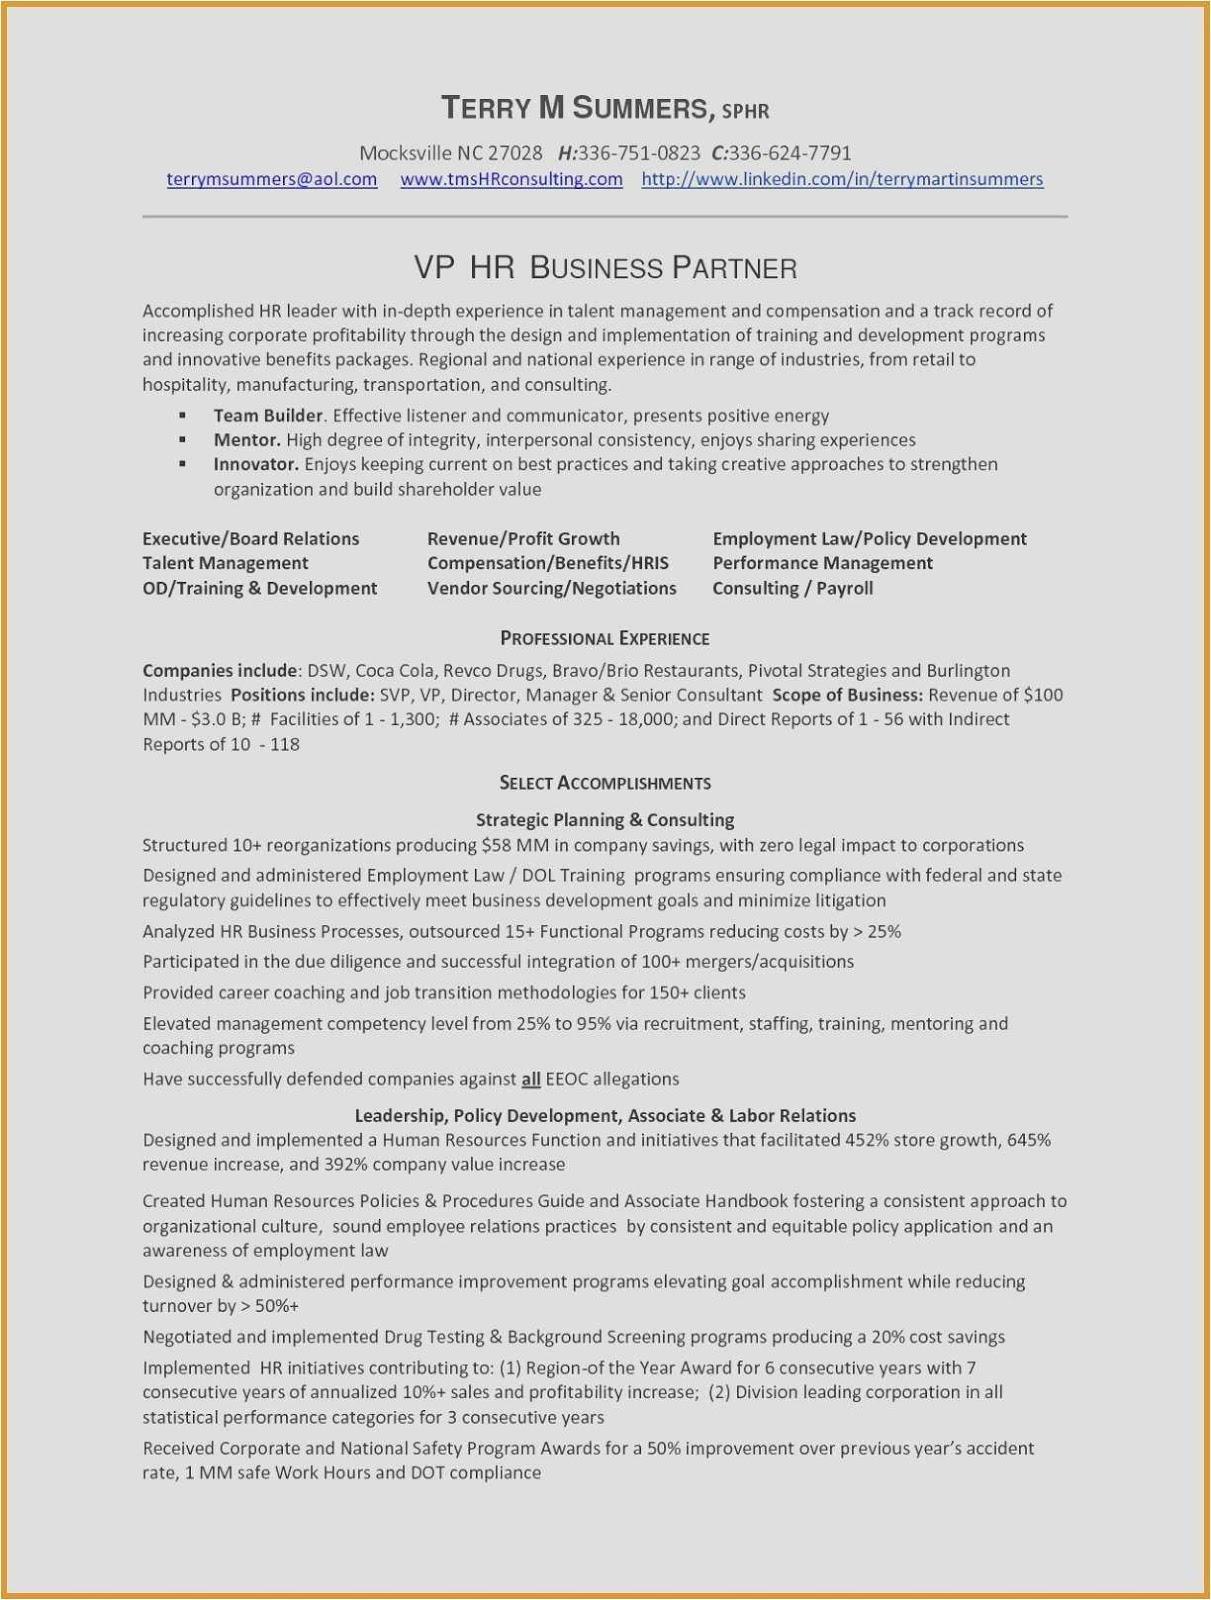 benefits analyst resume sample benefits analyst resume objective senior benefits analyst resume hr benefits analyst resume retirement benefits analyst resume sr benefits analyst resume sample pension benefits analyst resume employee benefits analyst resume sample compensation and benefits analyst resume sample benefits analyst resume examples resume for benefits analyst